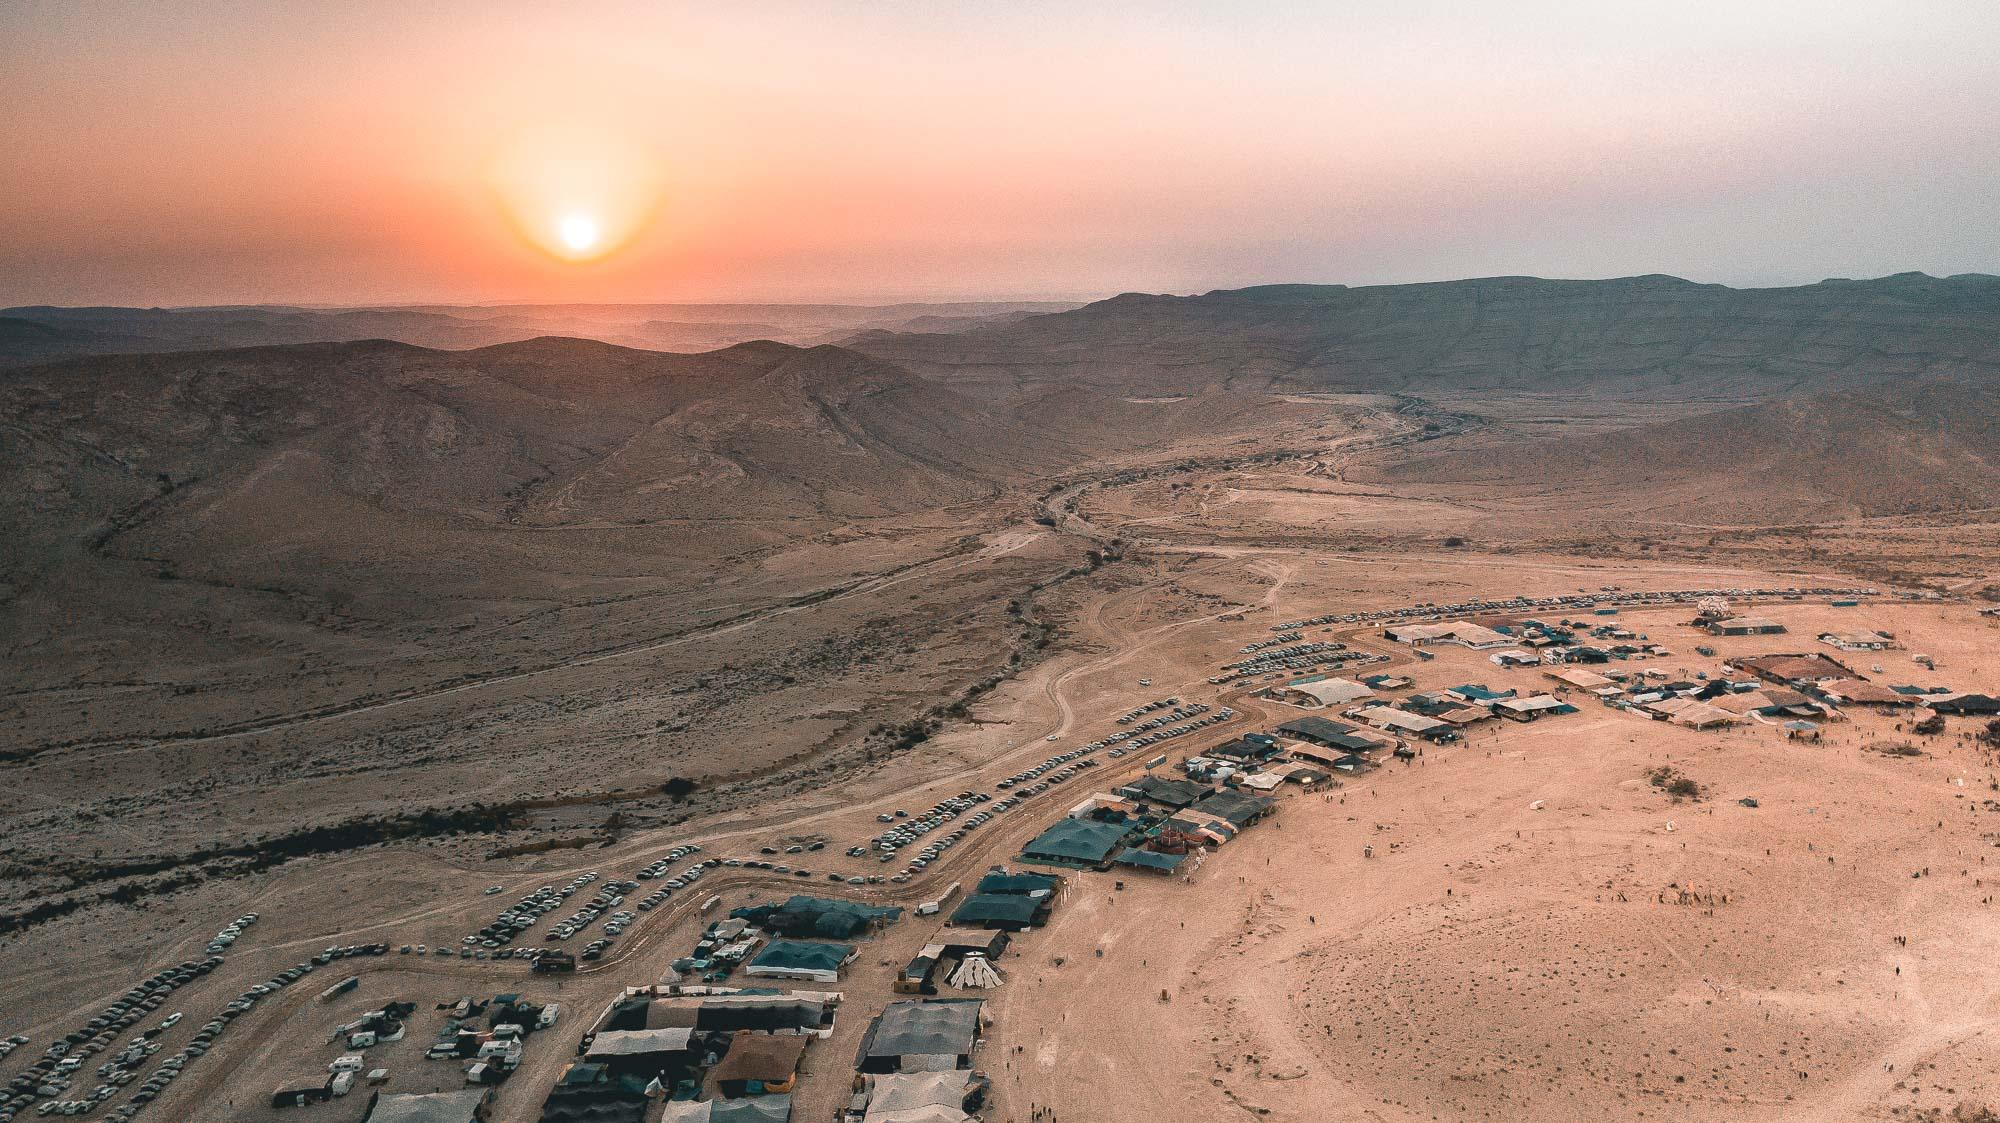 Welcome to MIDBURN: The Israeli Burning Man in the Dusty Negev Desert